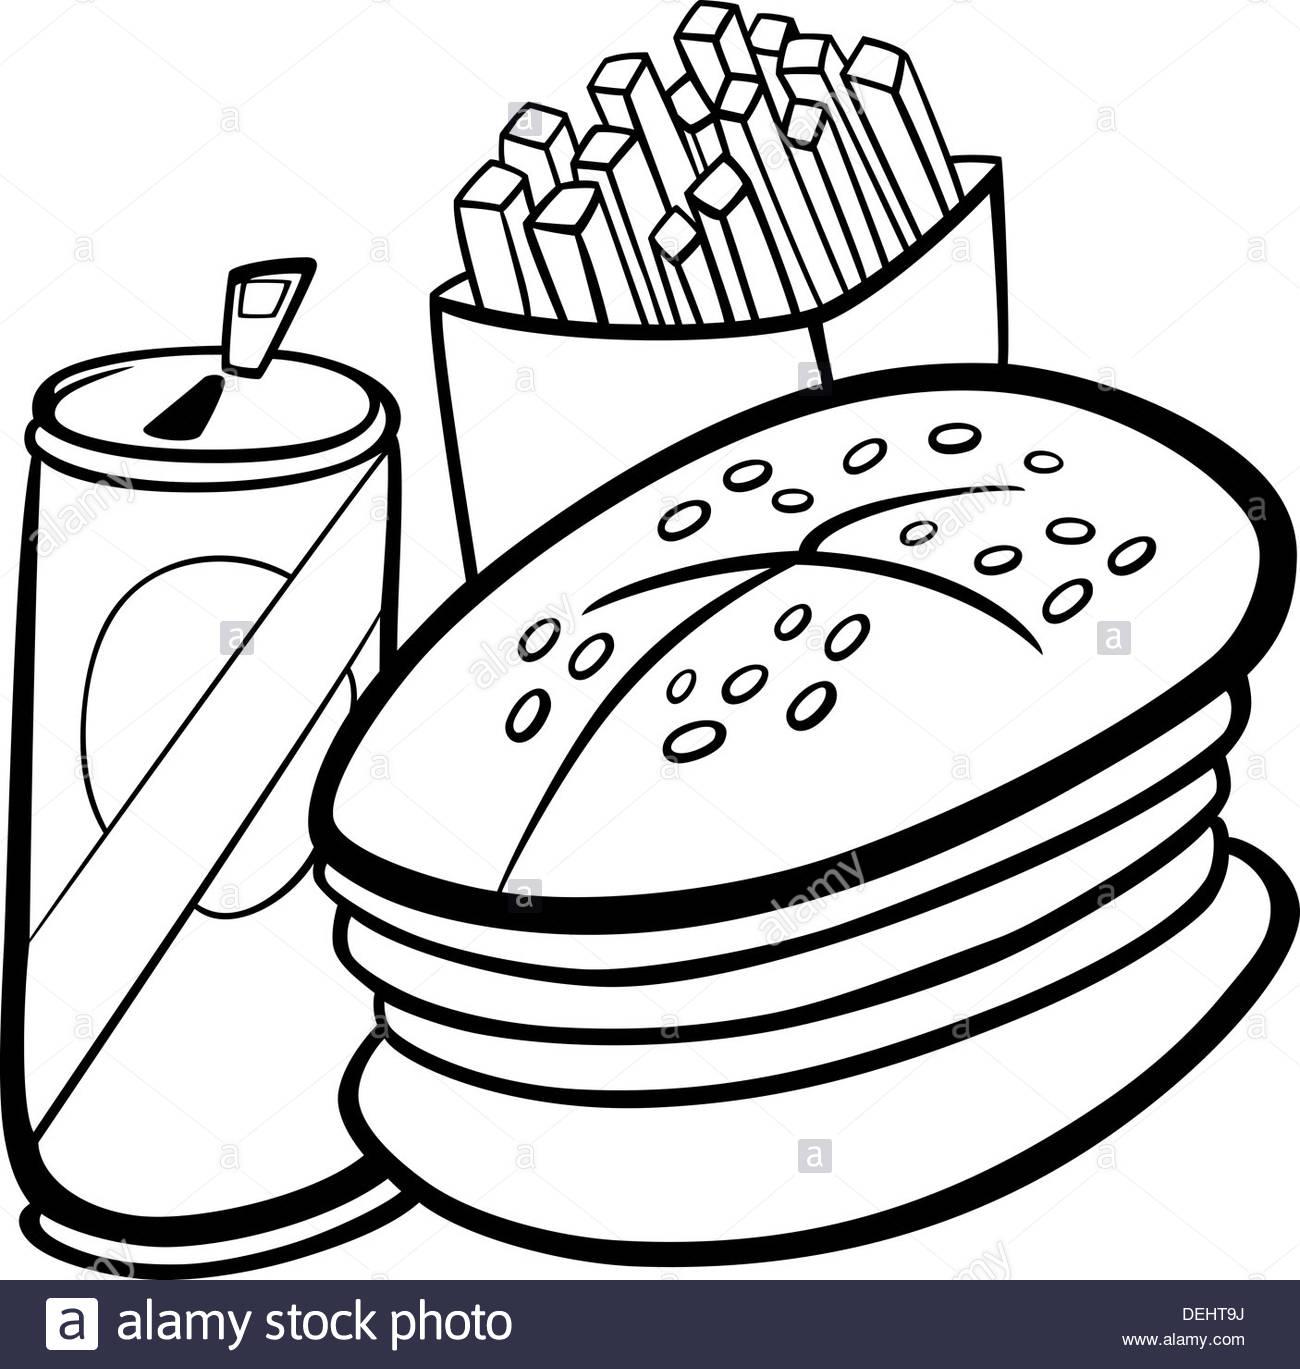 Black and White Cartoon Illustration of Fast Food Set with Hamburger.